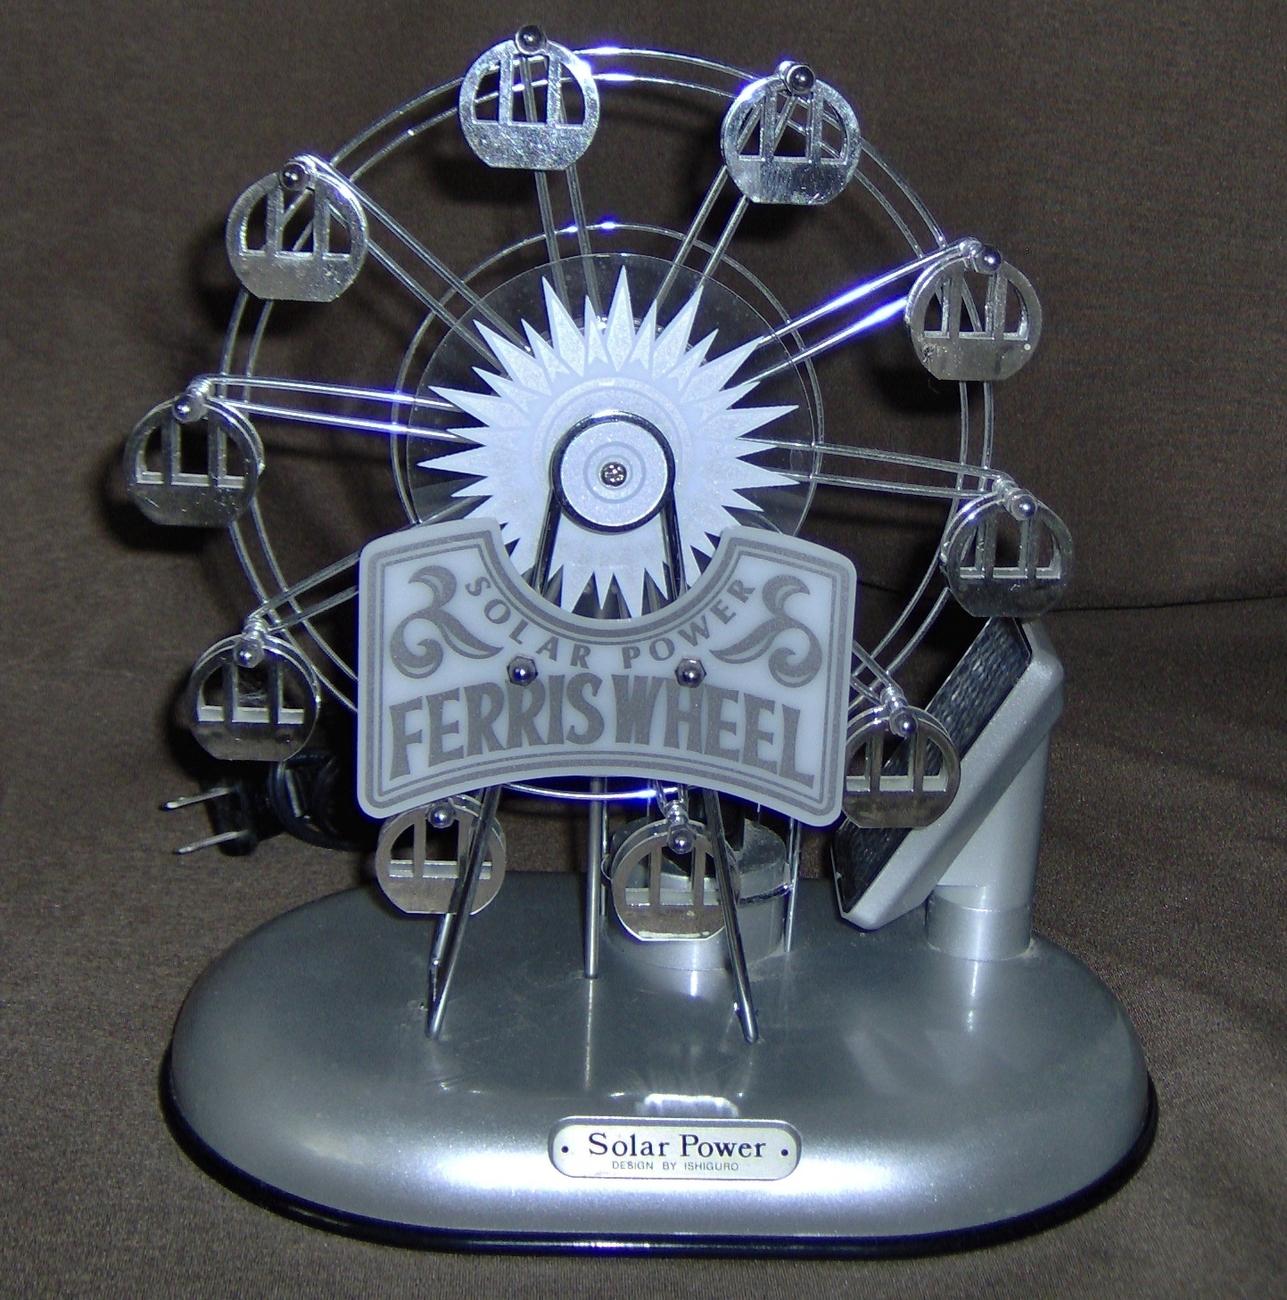 Ferris wheel /solar powered / electric night light